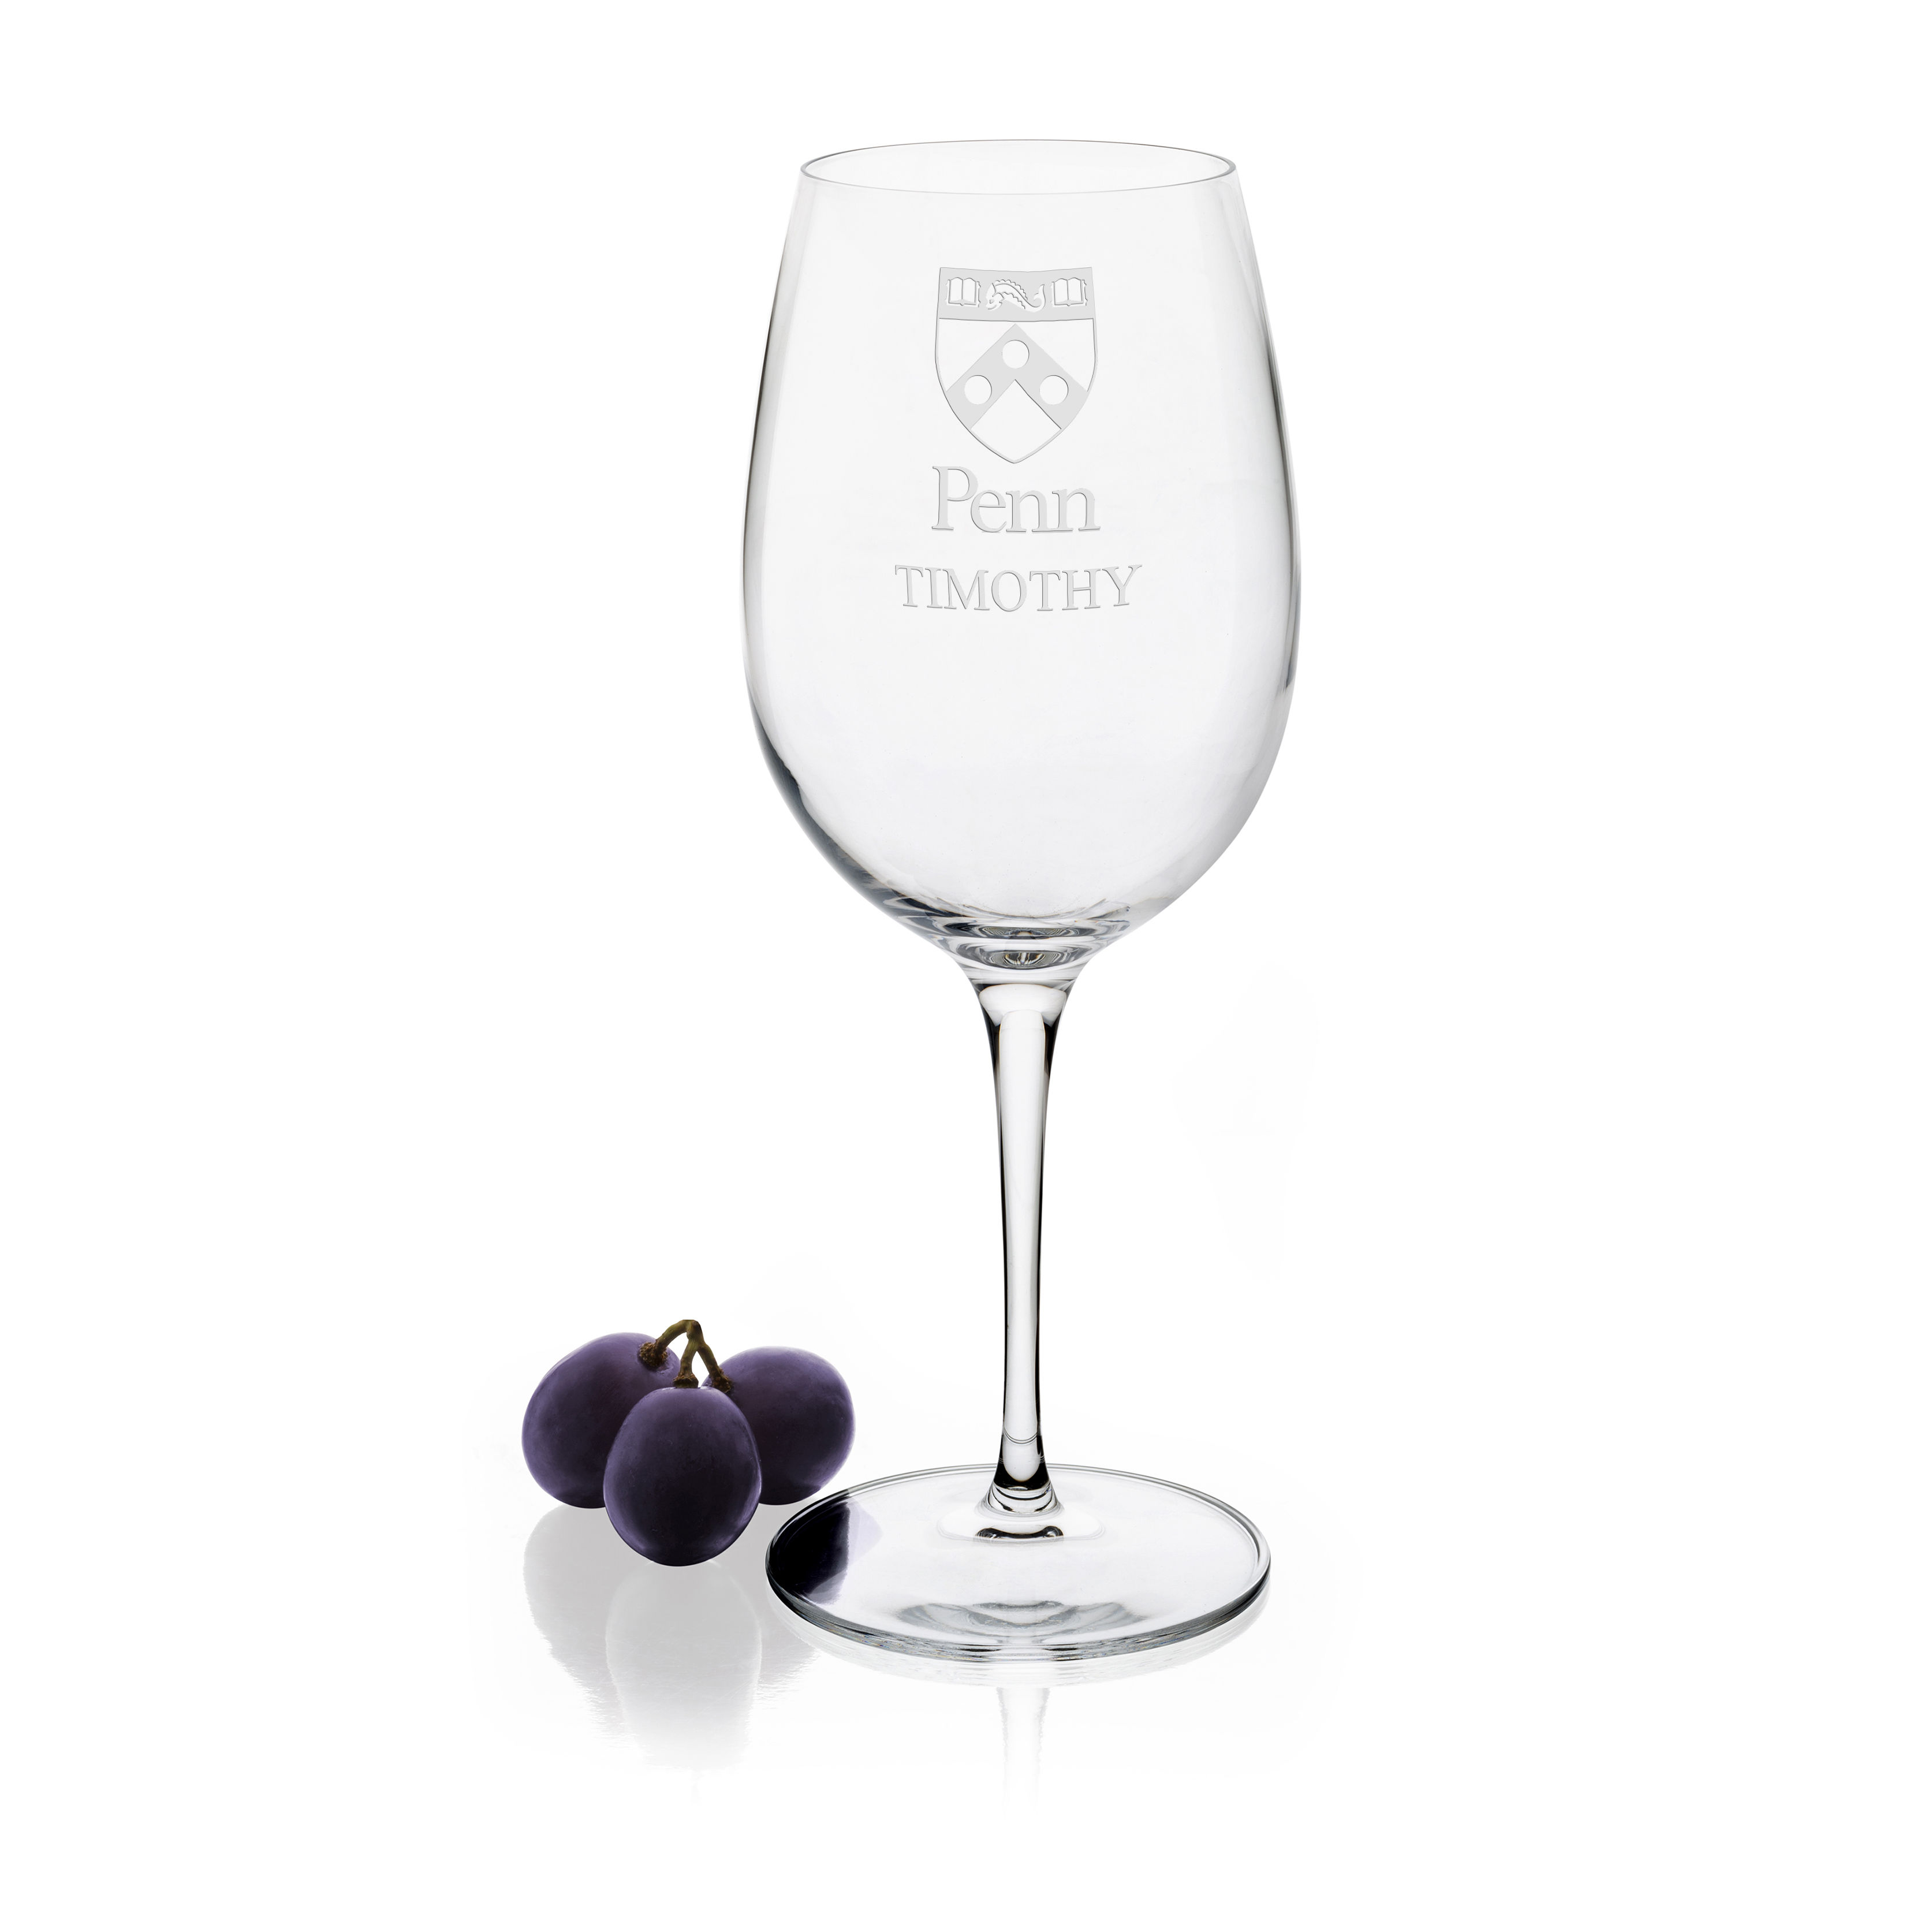 University of Pennsylvania Red Wine Glasses - Set of 2